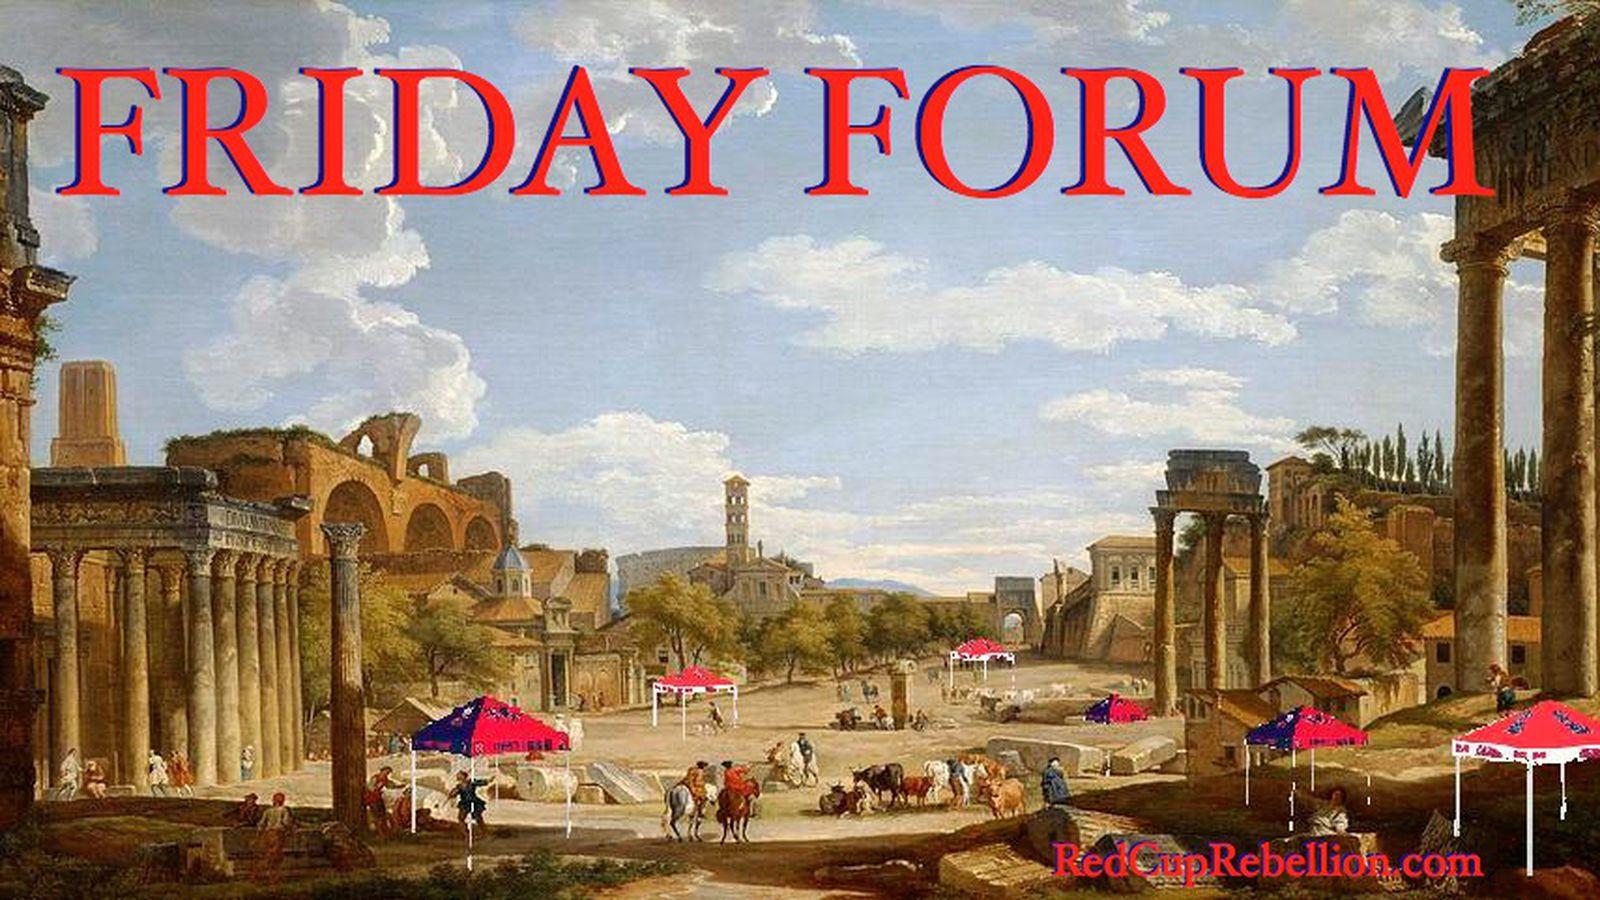 Fridayforum.0